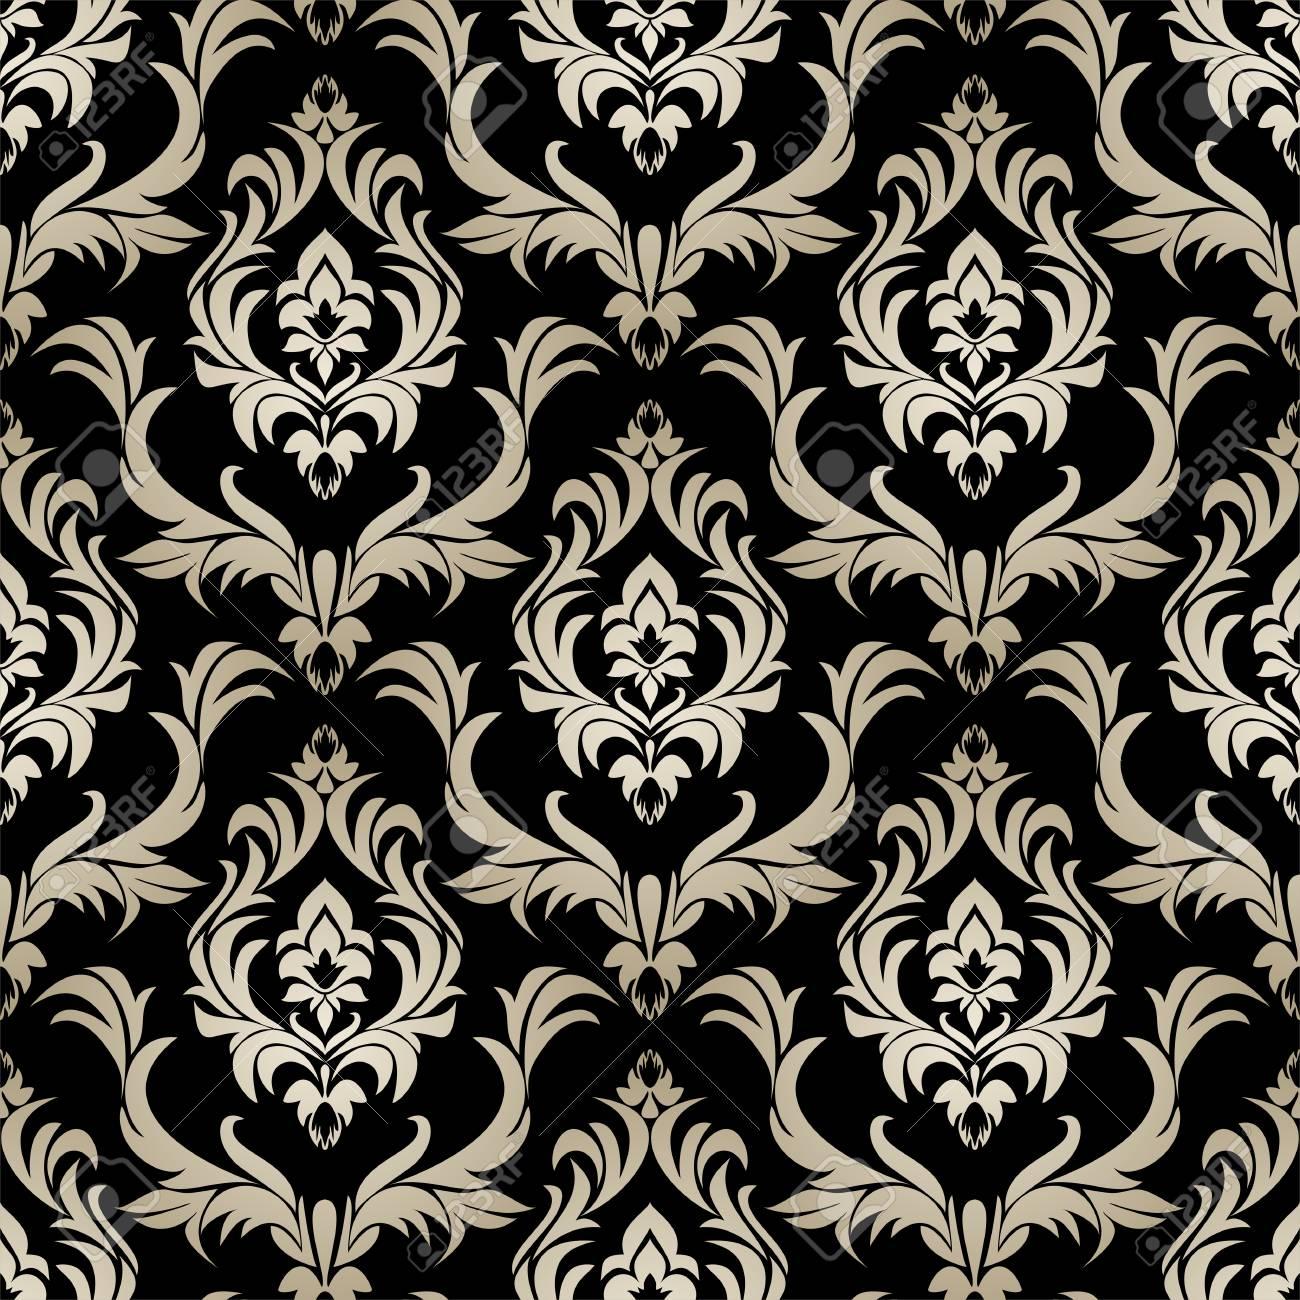 Seamless retro damask Wallpaper - silver floral Ornament on black. - 97511675